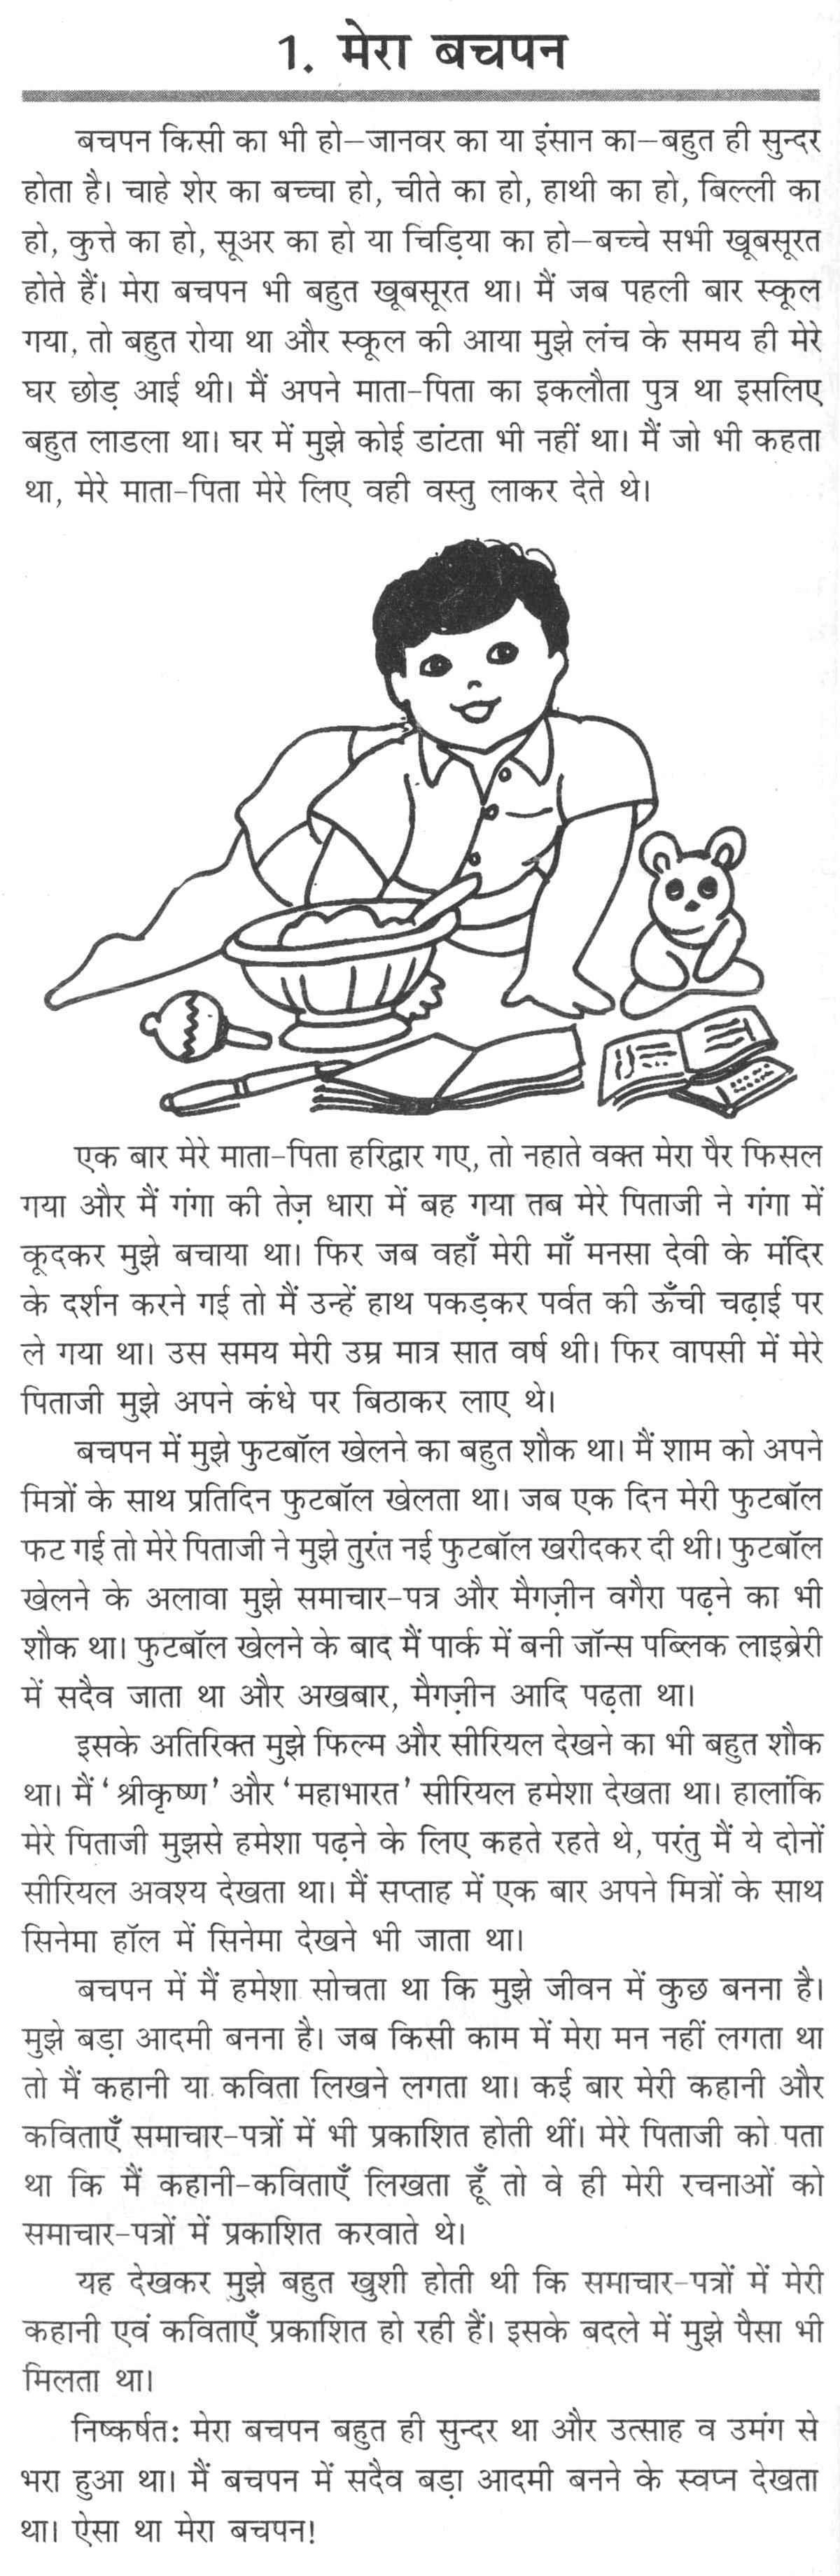 Essay On My Childhood In Hindi Essay Memories Essay Childhood Memories Essay